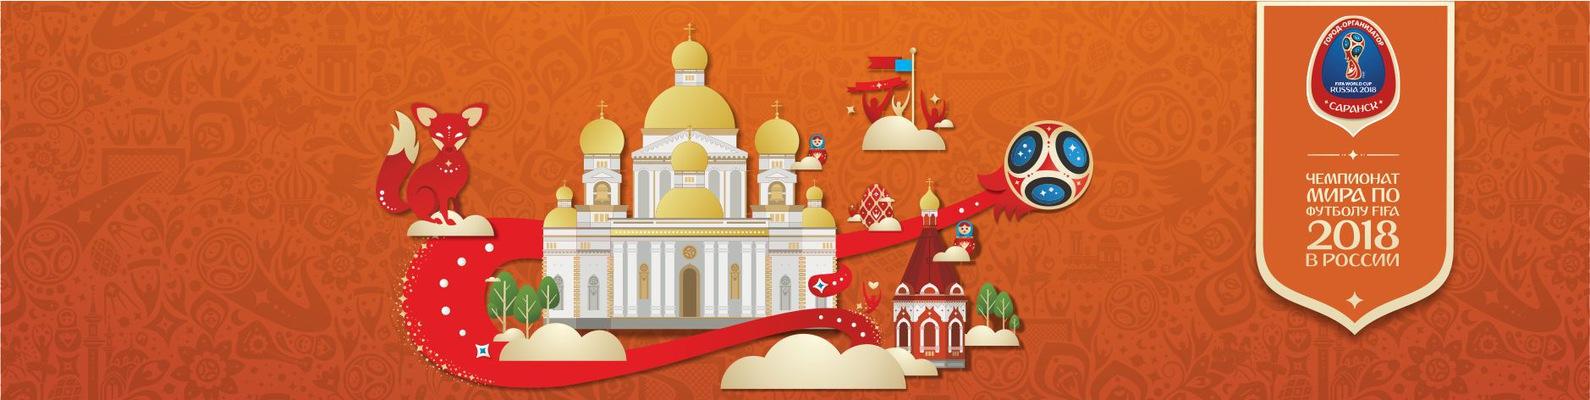 Чемпионат Мира По Футболу Fifa 2018 Саранск